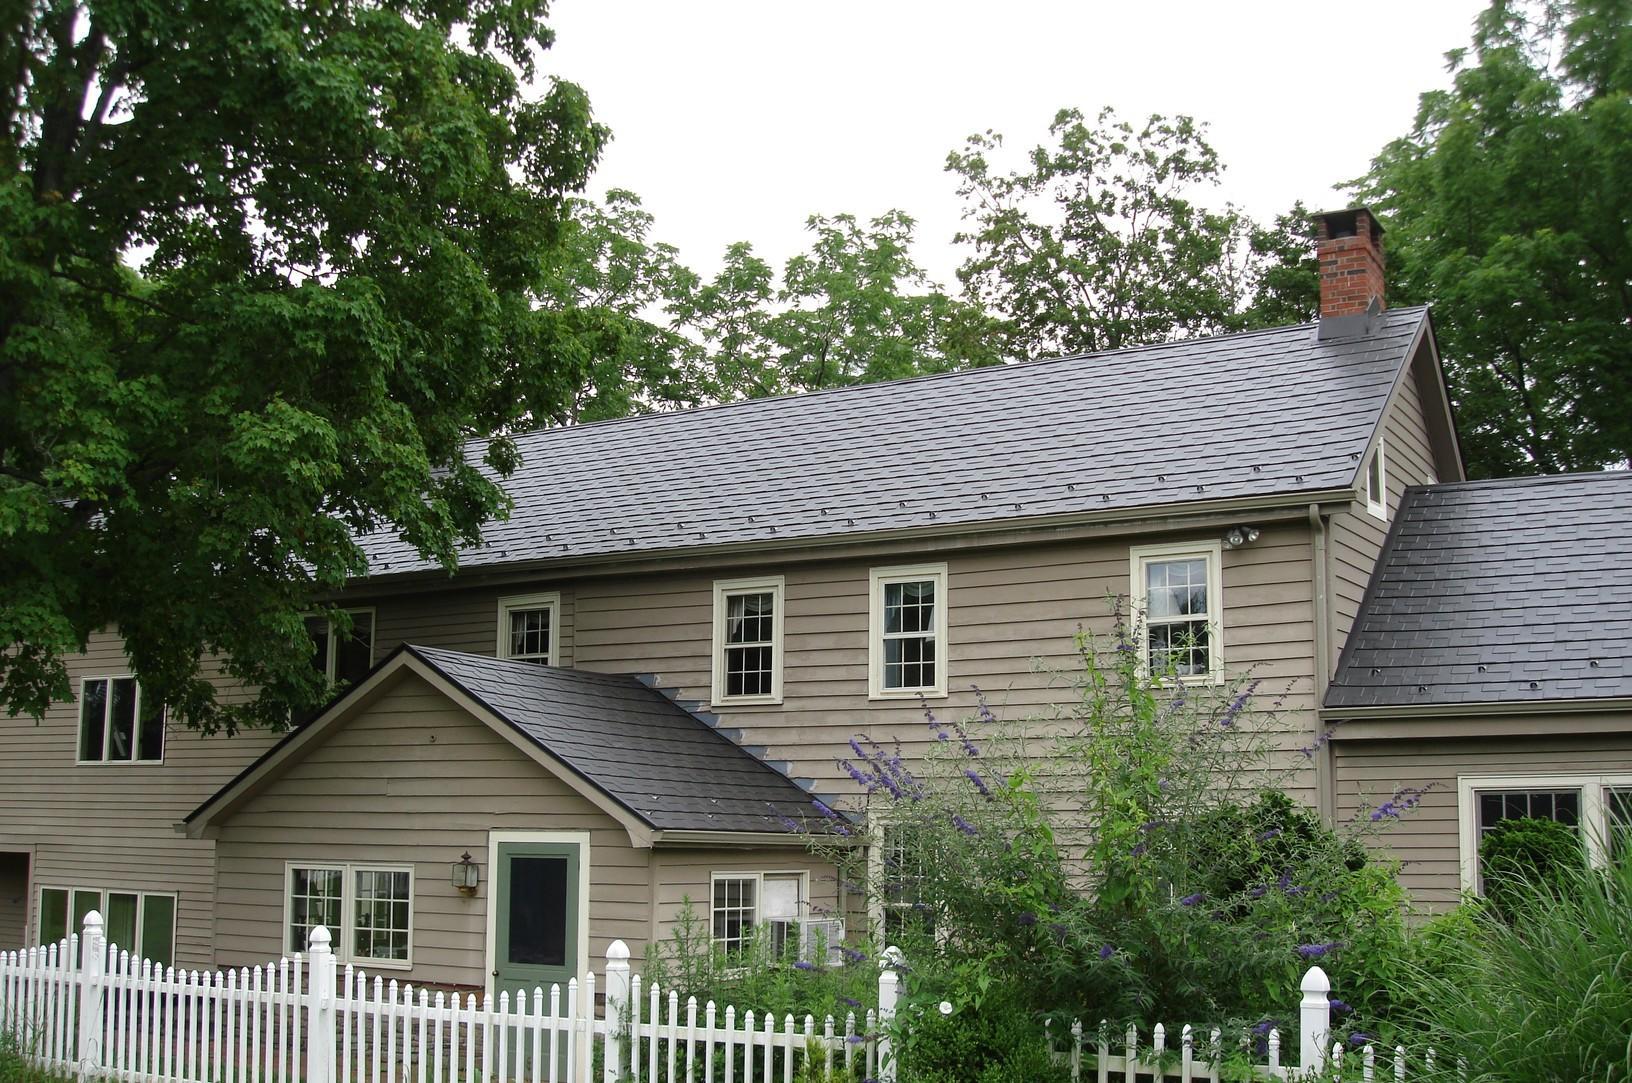 Steel Slate Metal Roof Installation in Frenchtown, NJ